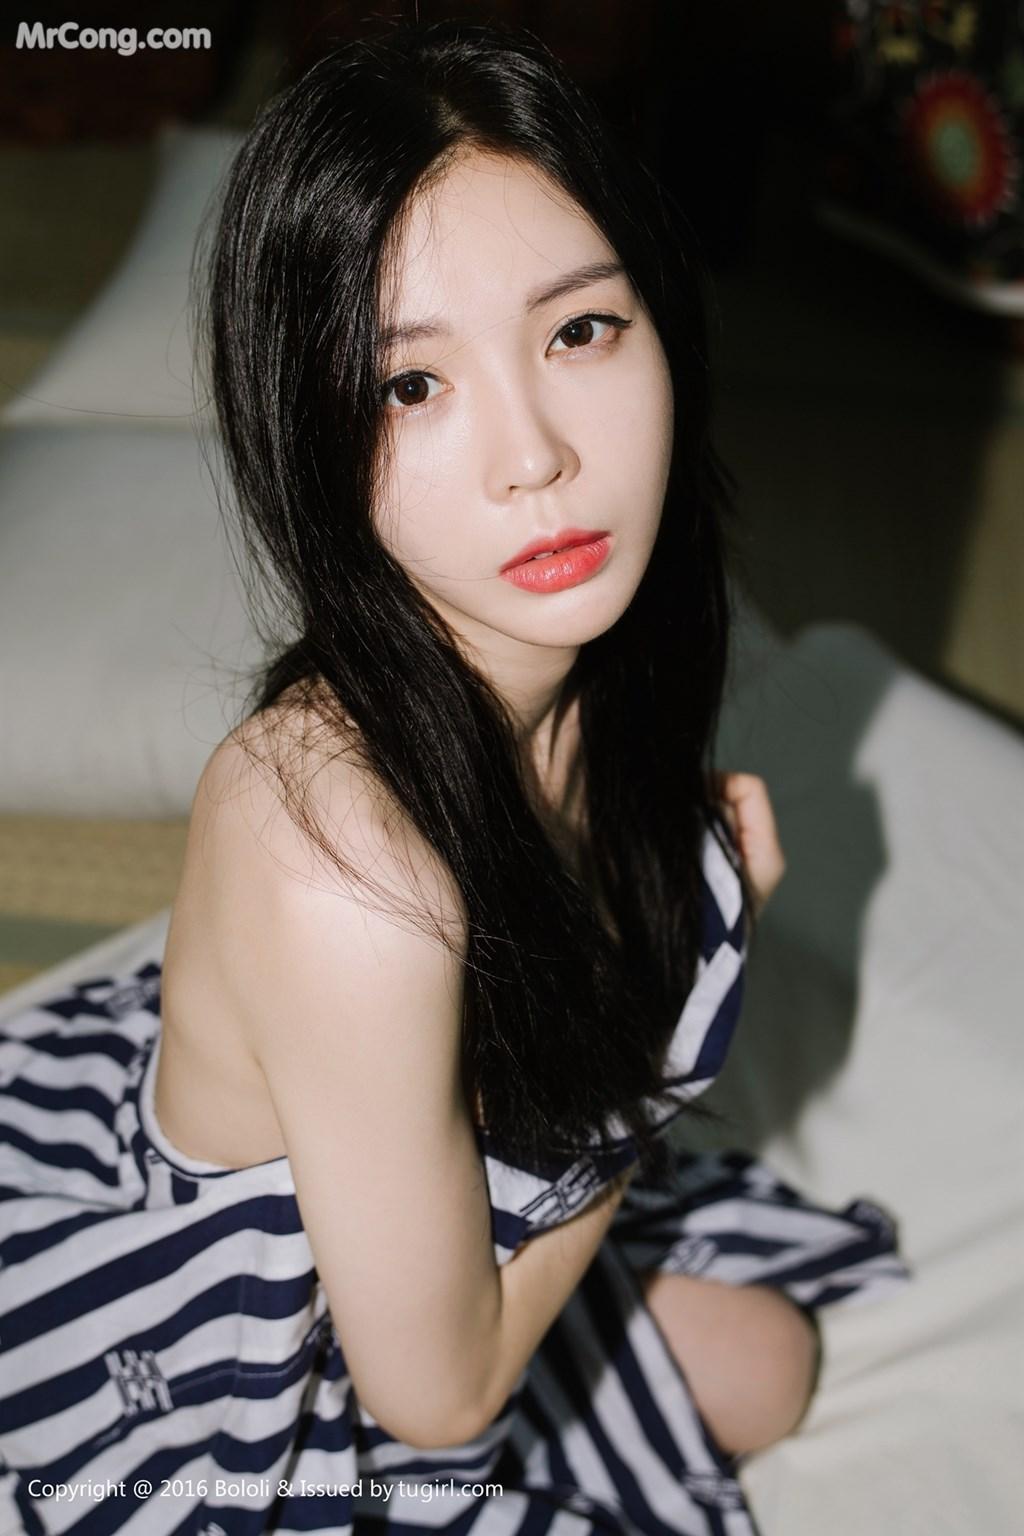 Image BoLoli-2017-09-17-Vol.118-Bebe-Kim-MrCong.com-045 in post BoLoli 2017-09-17 Vol.118: Người mẫu Bebe_Kim (48 ảnh)